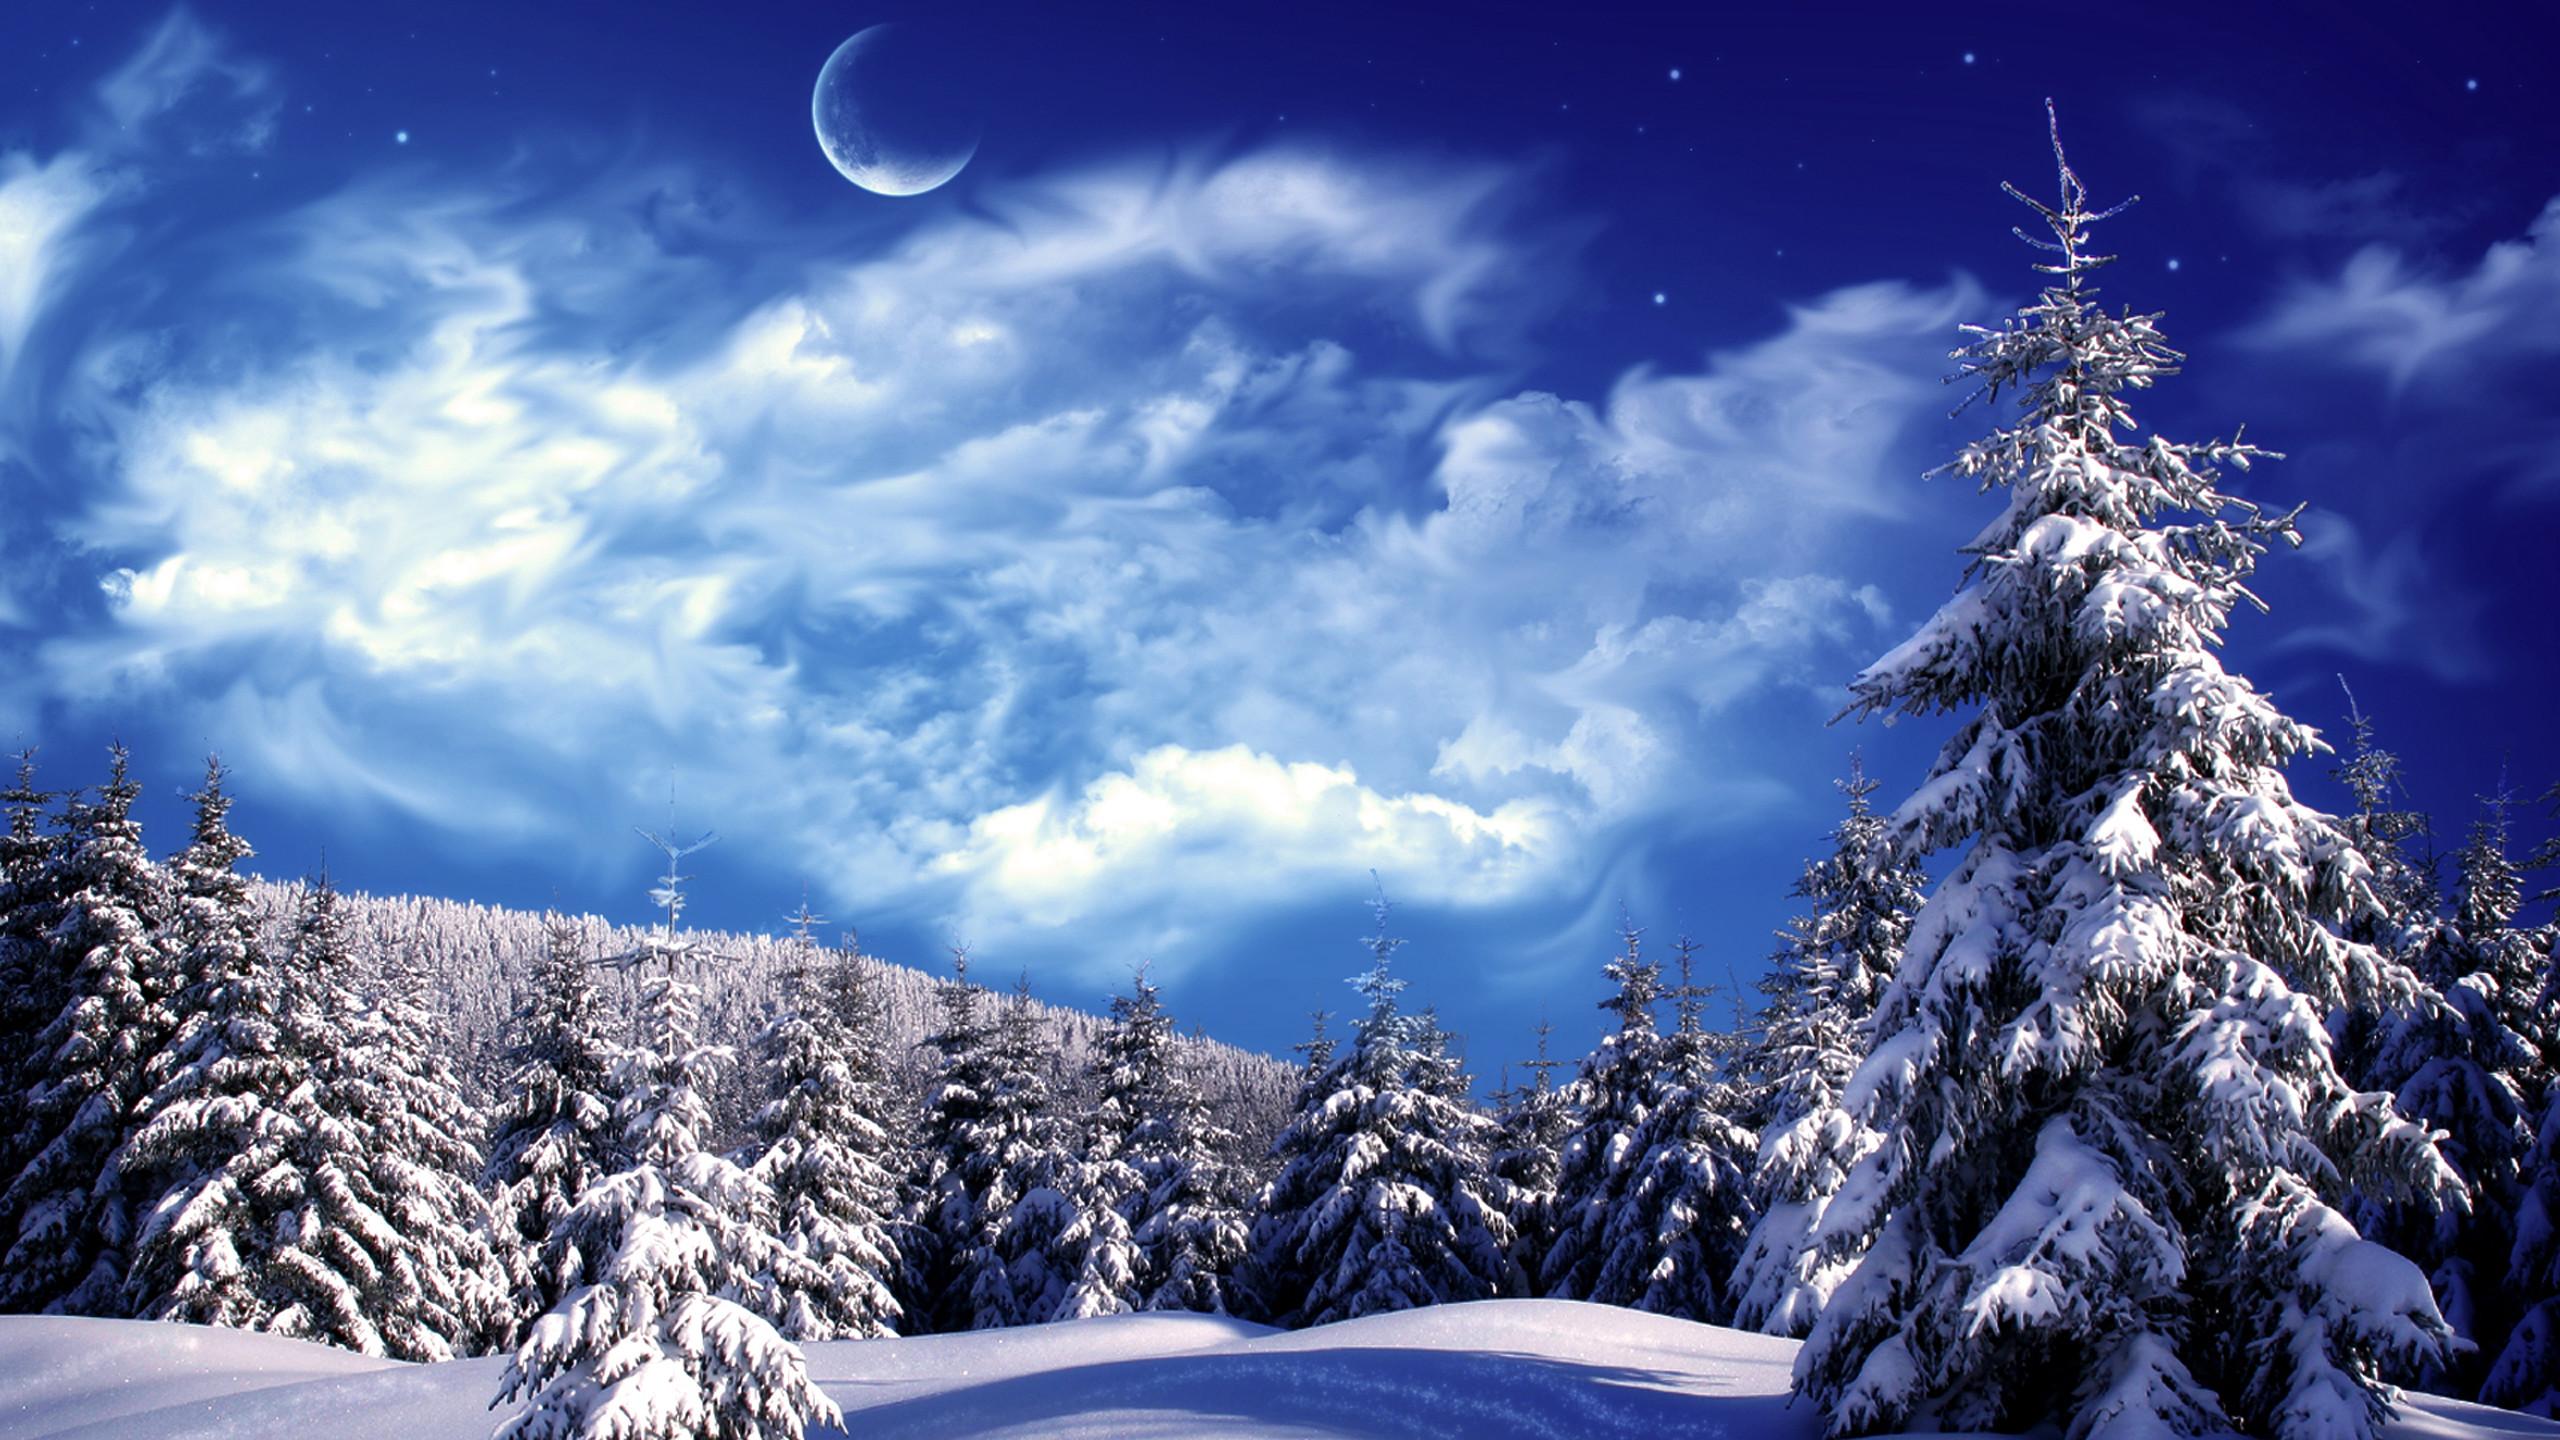 Winter And Snow Scenes | Wallpaper Bonzy